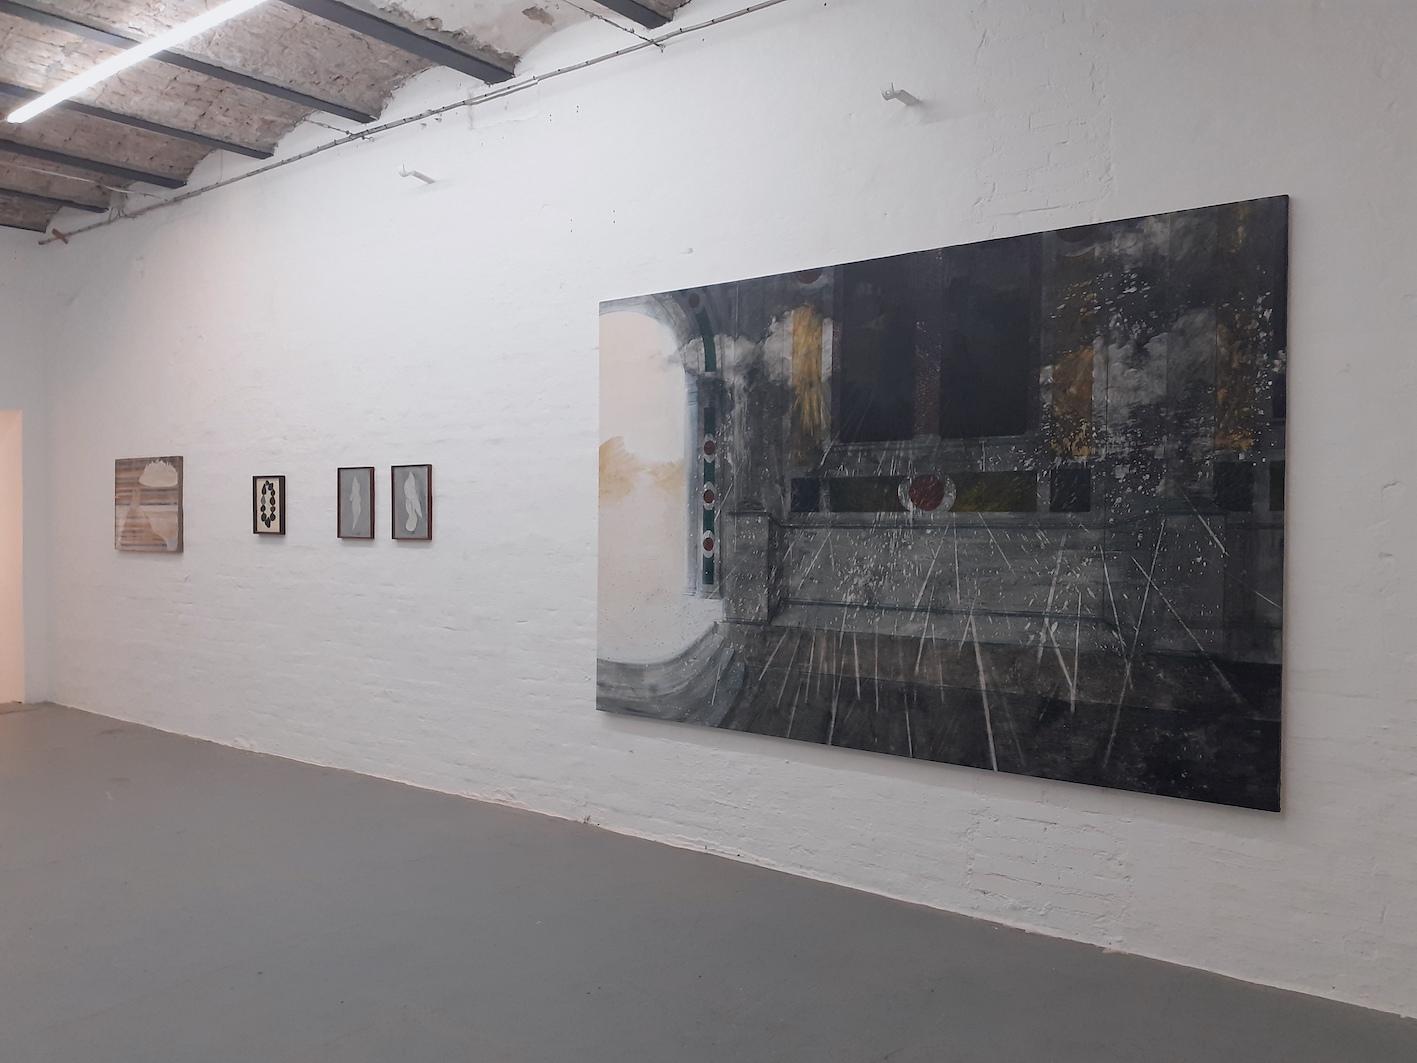 Together We Stand, installation view, Giulio Malinverni, Maurizio Donzelli, 2020, courtesy Marignana Arte